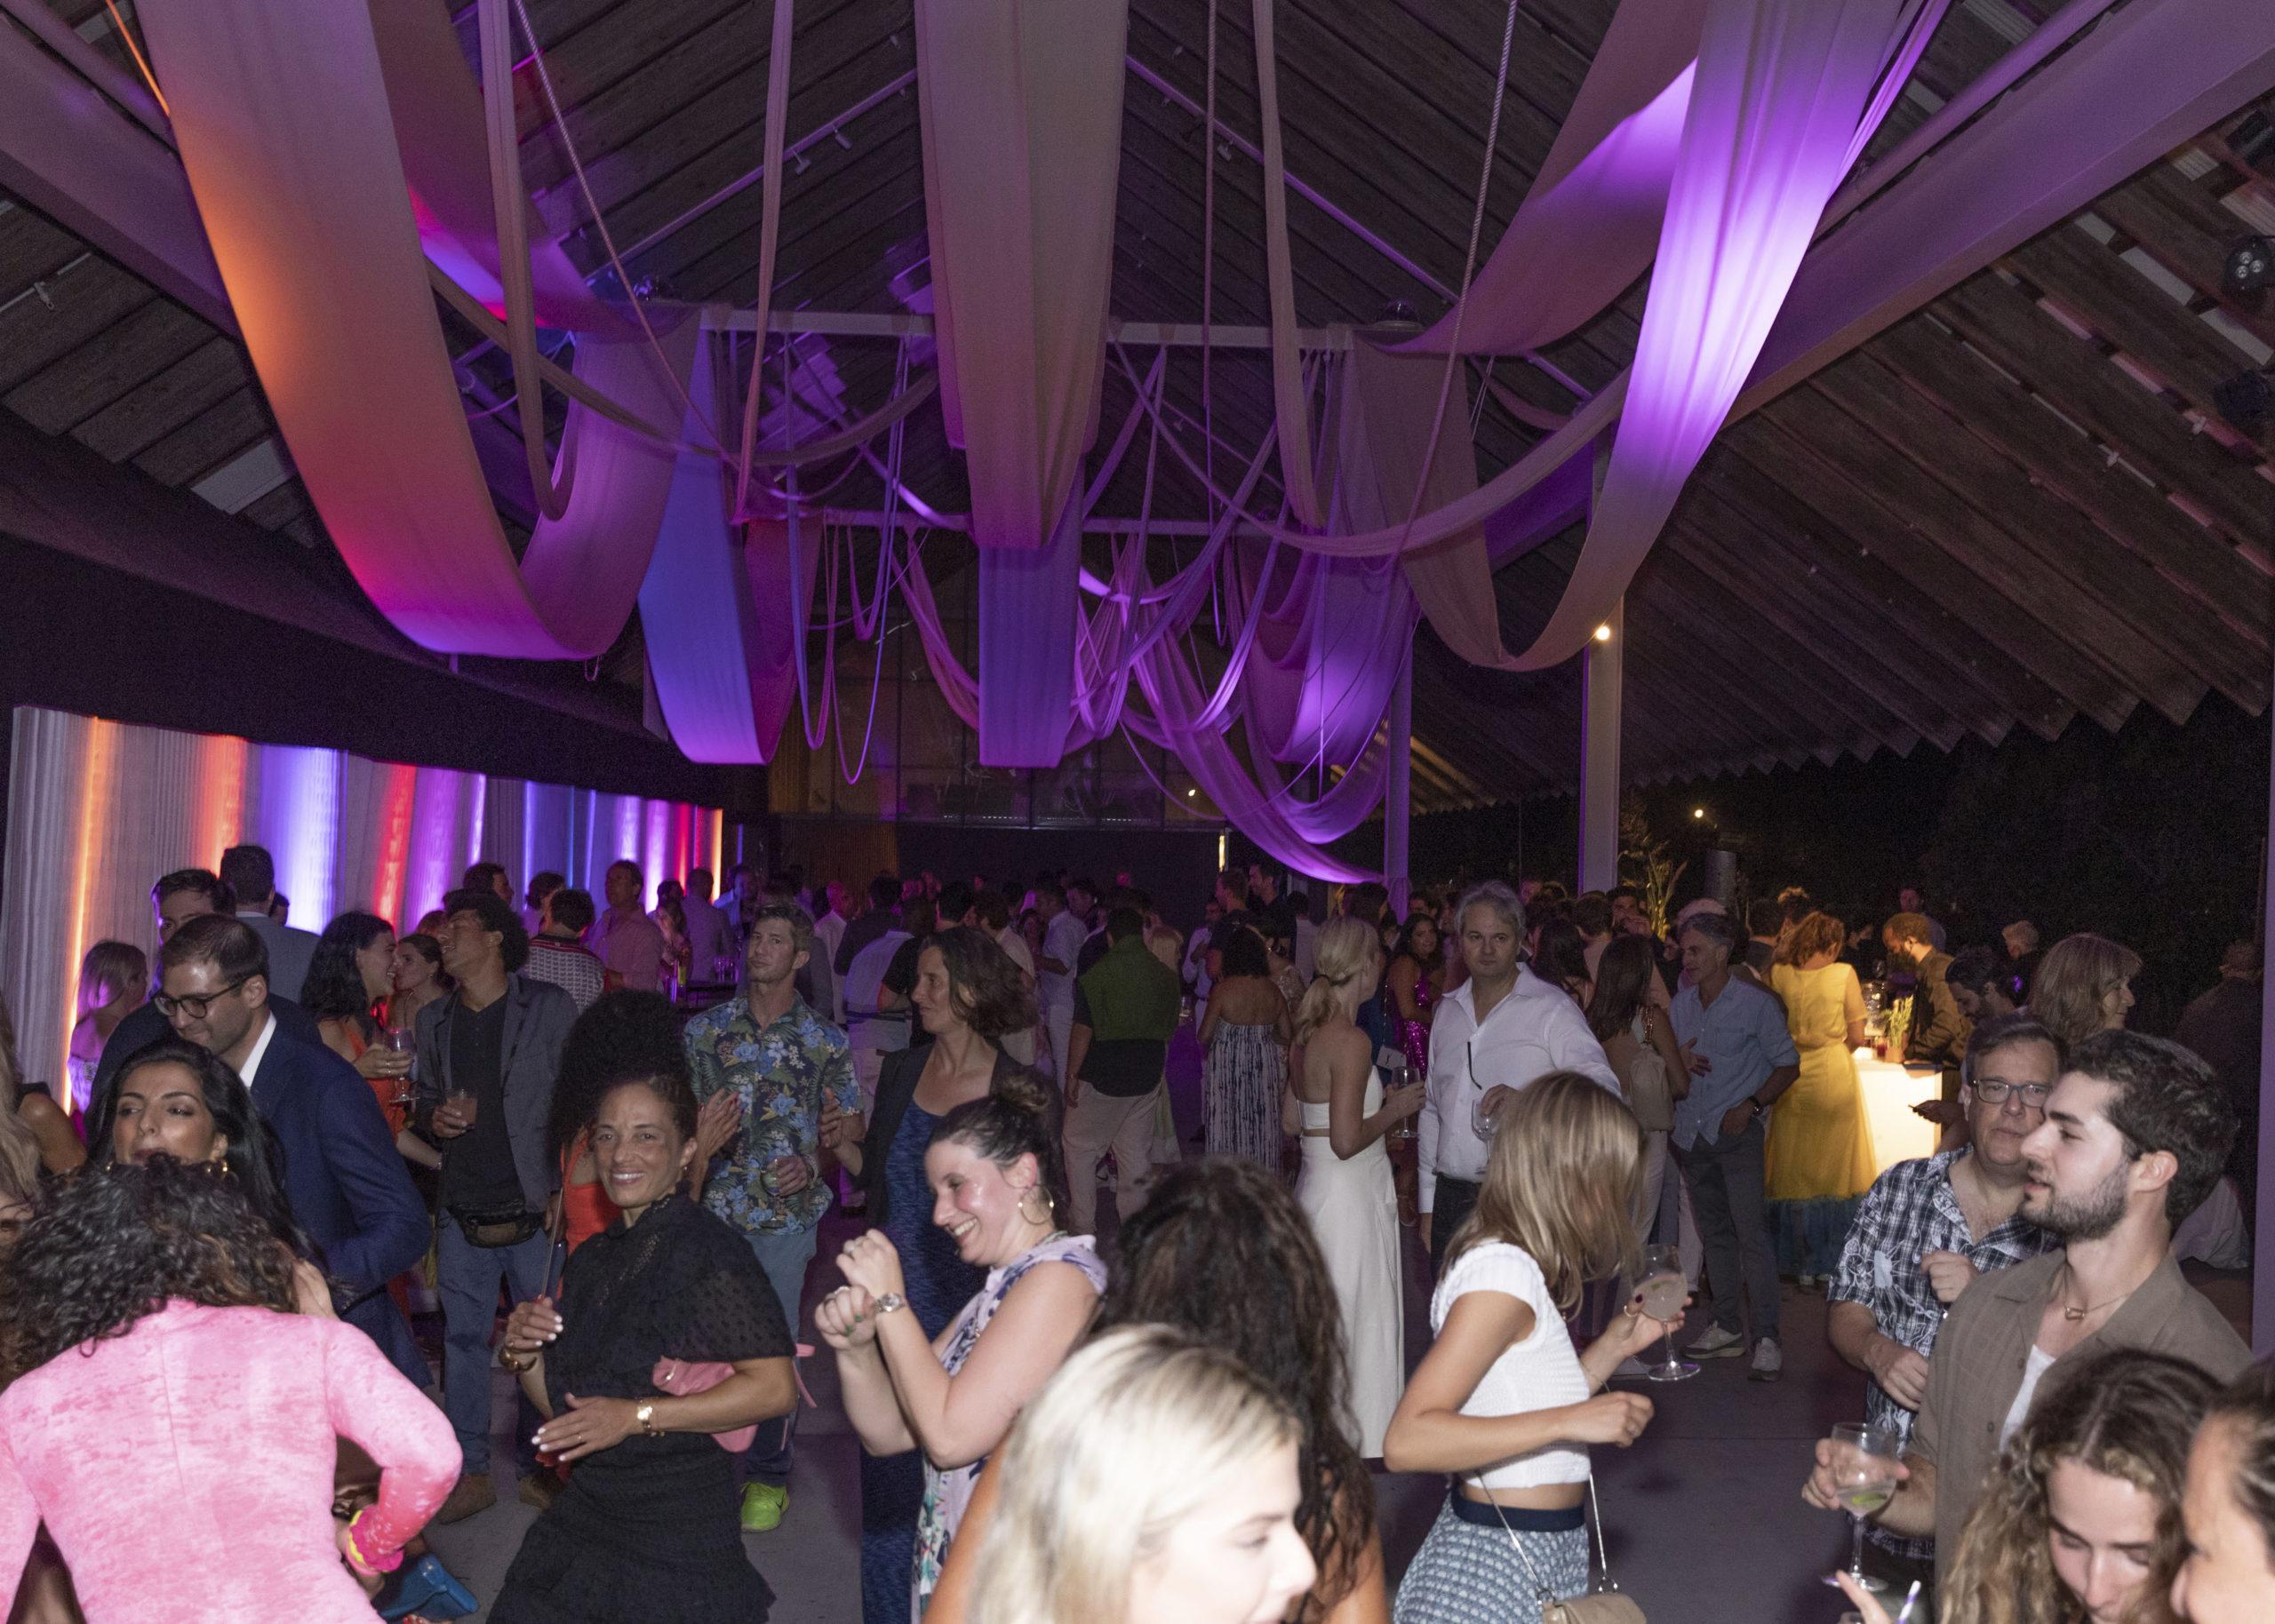 The Parrish Art Museum's Midsummer Dance on August 13 featured a DJ Set by James Murphy (DFA Records/LCD Soundsystem).   YVONNE TNT/BFA.COM COURTESY PARRISH ART MUSUEM